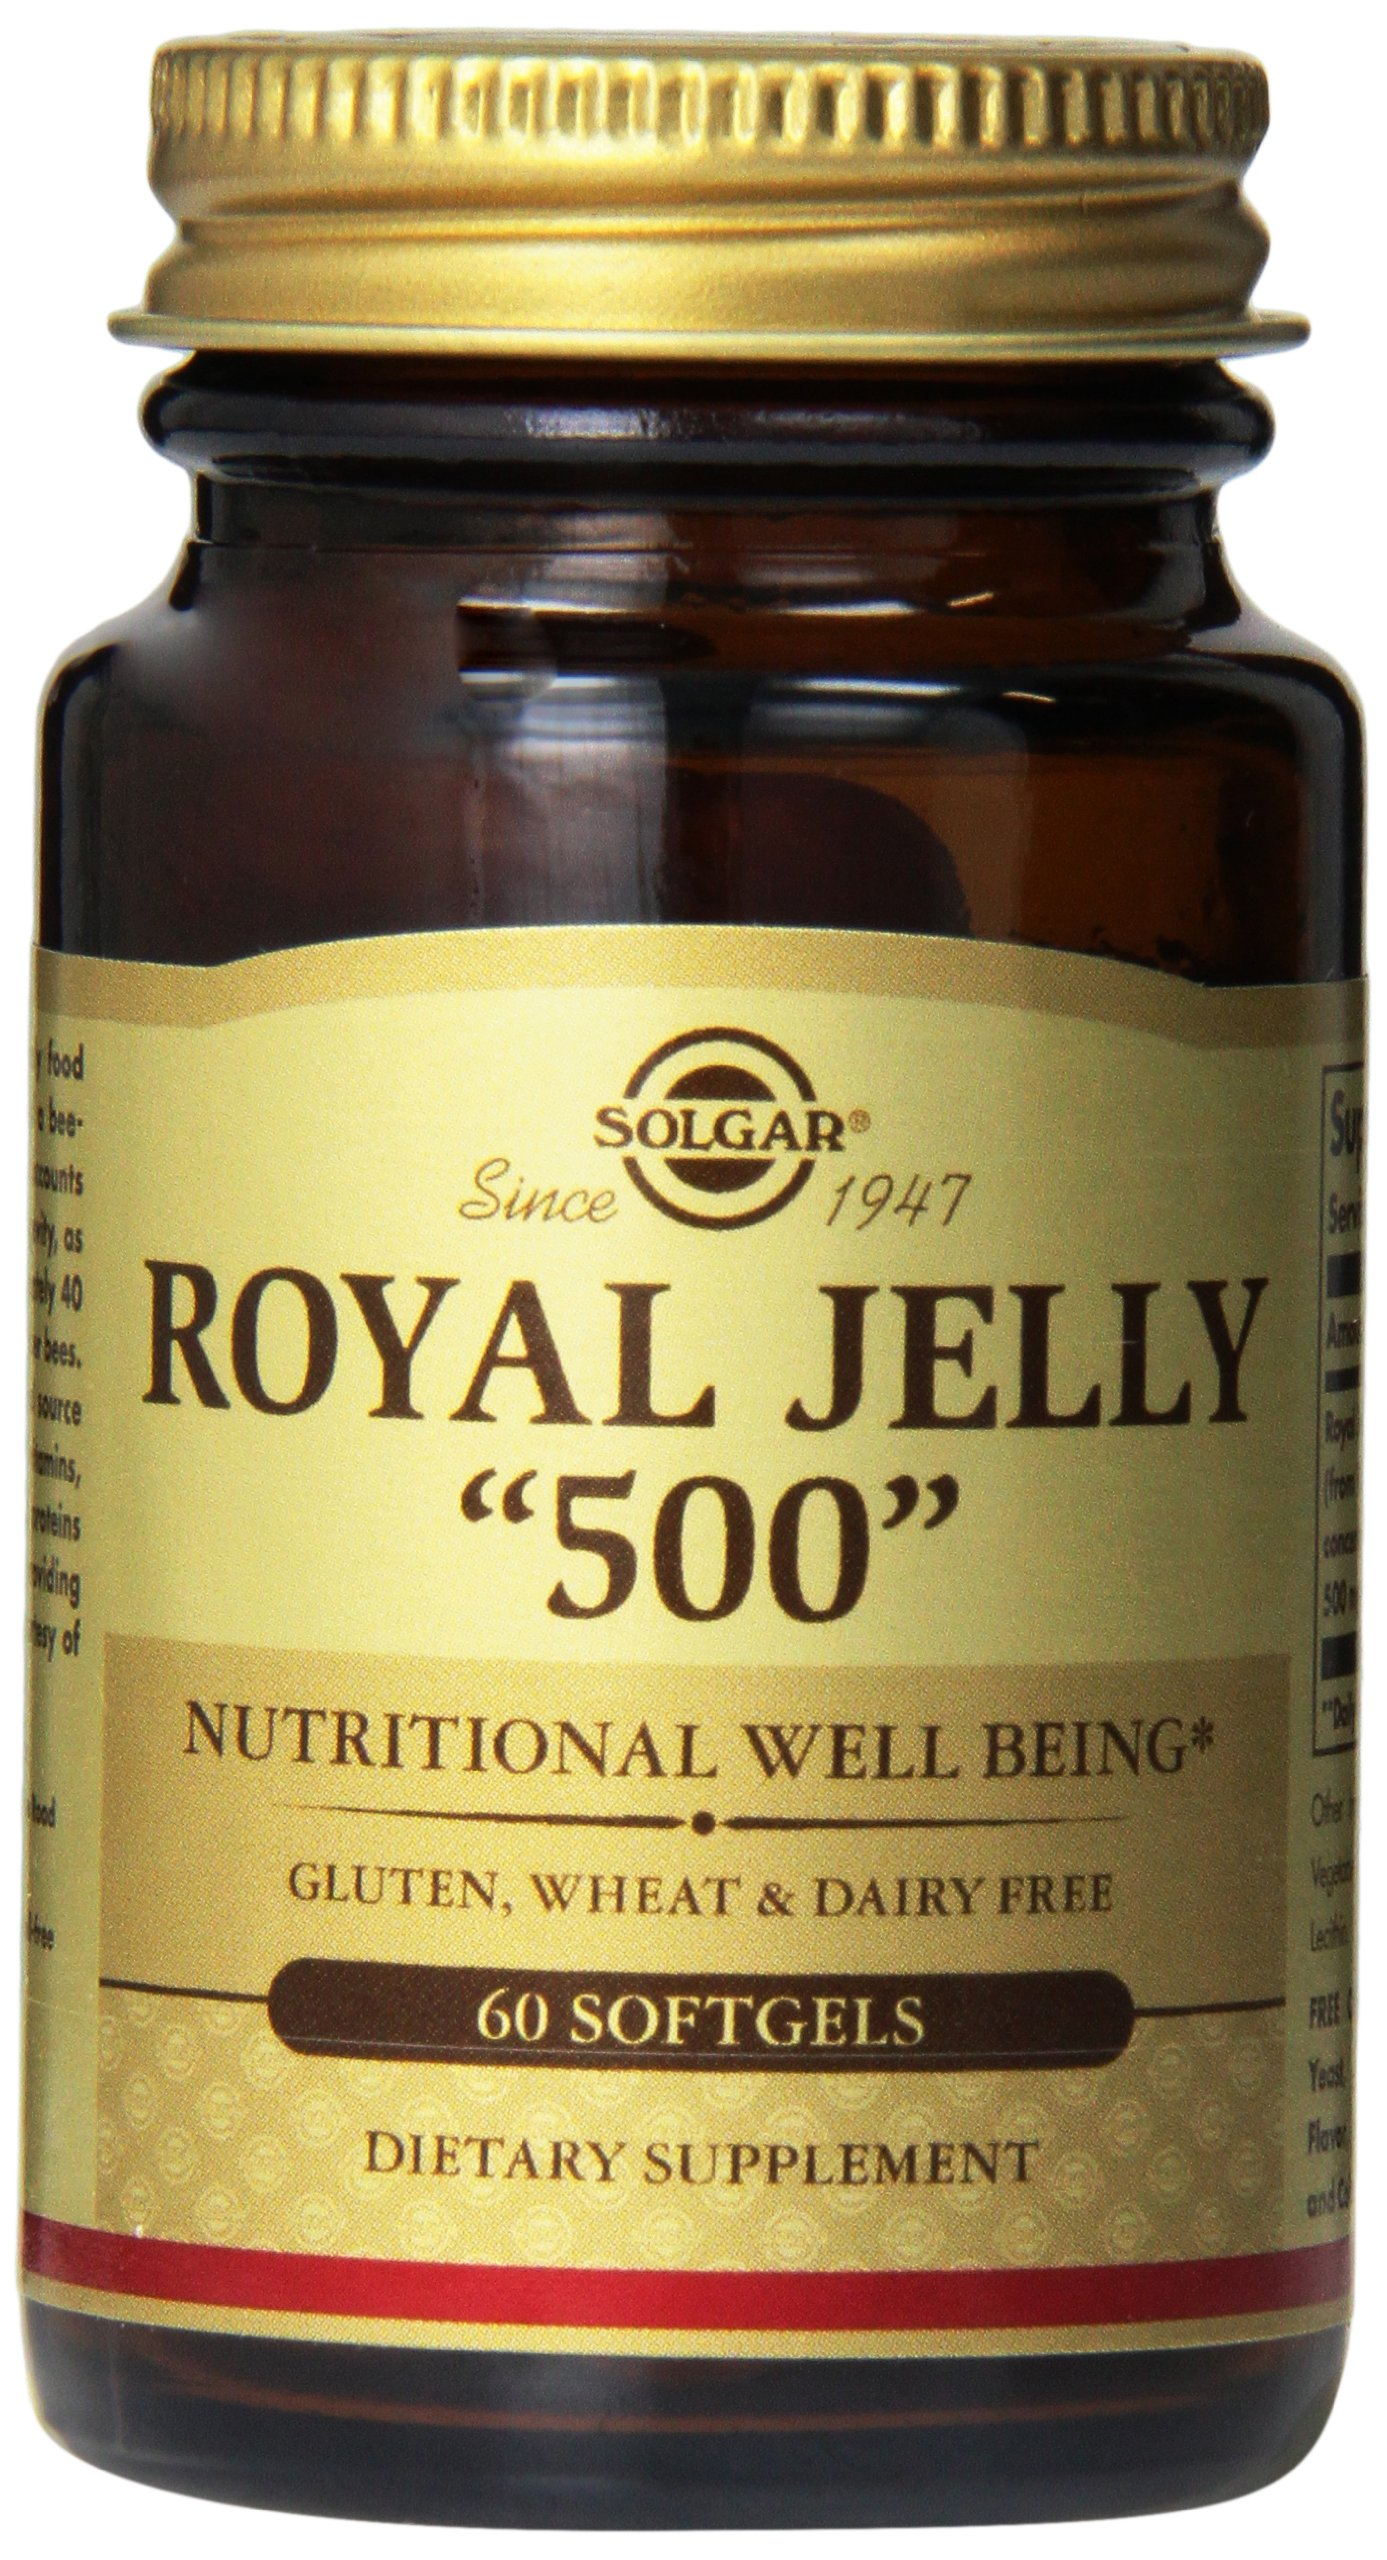 Solgar - Royal Jelly''500'' Supplement, 60 Softgels